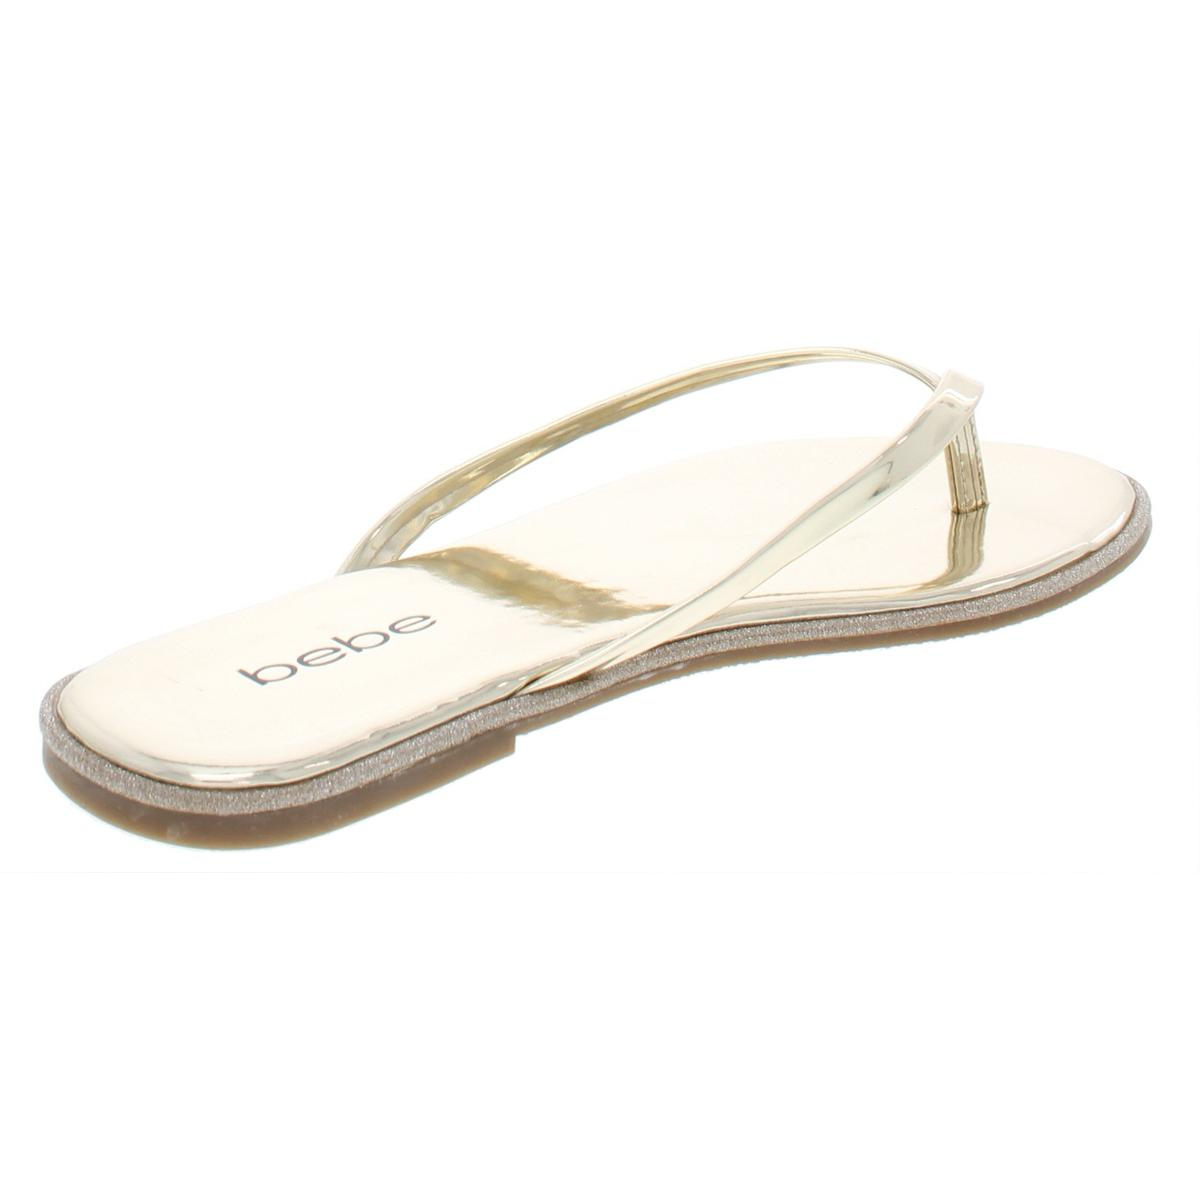 Bebe-Womens-Ilistra-Patent-Slide-Flip-Flops-Shoes-BHFO-7633 thumbnail 6